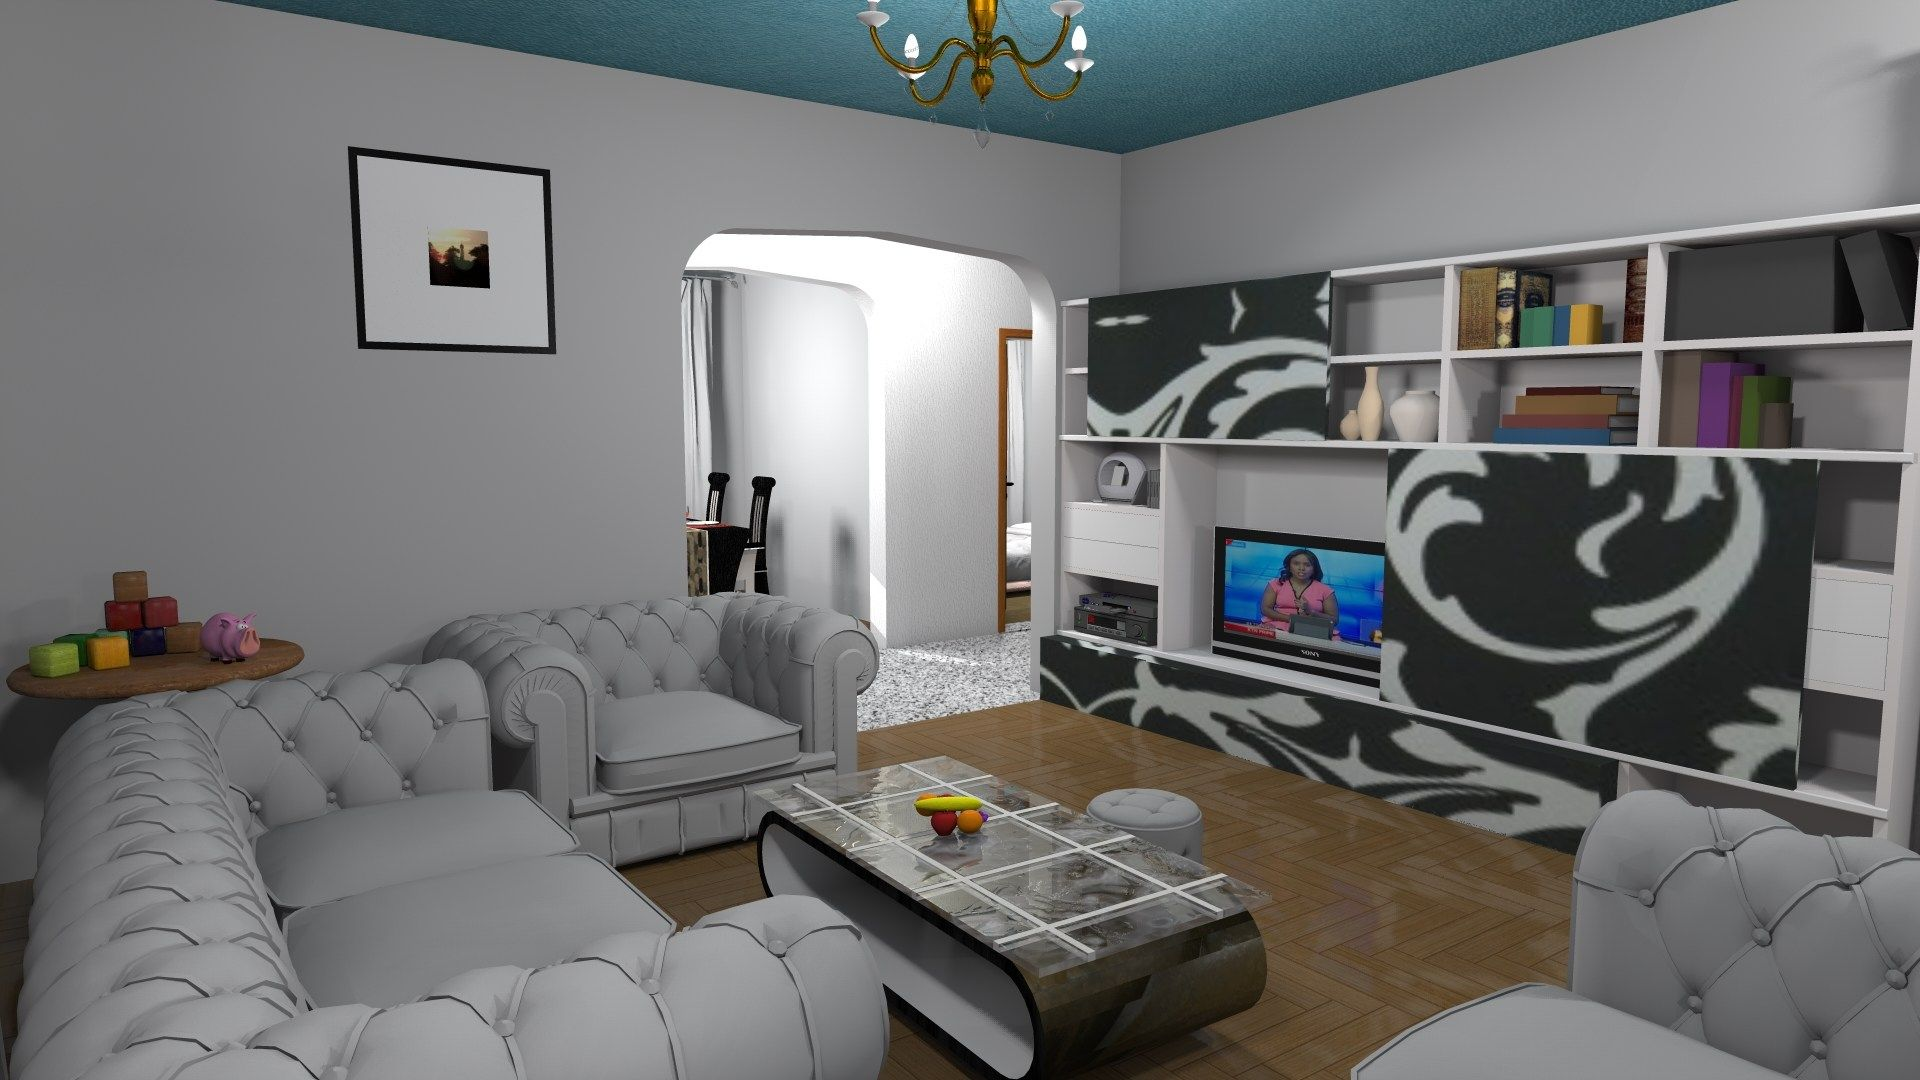 Three Bedroom Bungalow House Design In Kenya 3d Muthurwa Com In 2020 Bungalow House Design 4 Bedroom House Designs Three Bedroom House